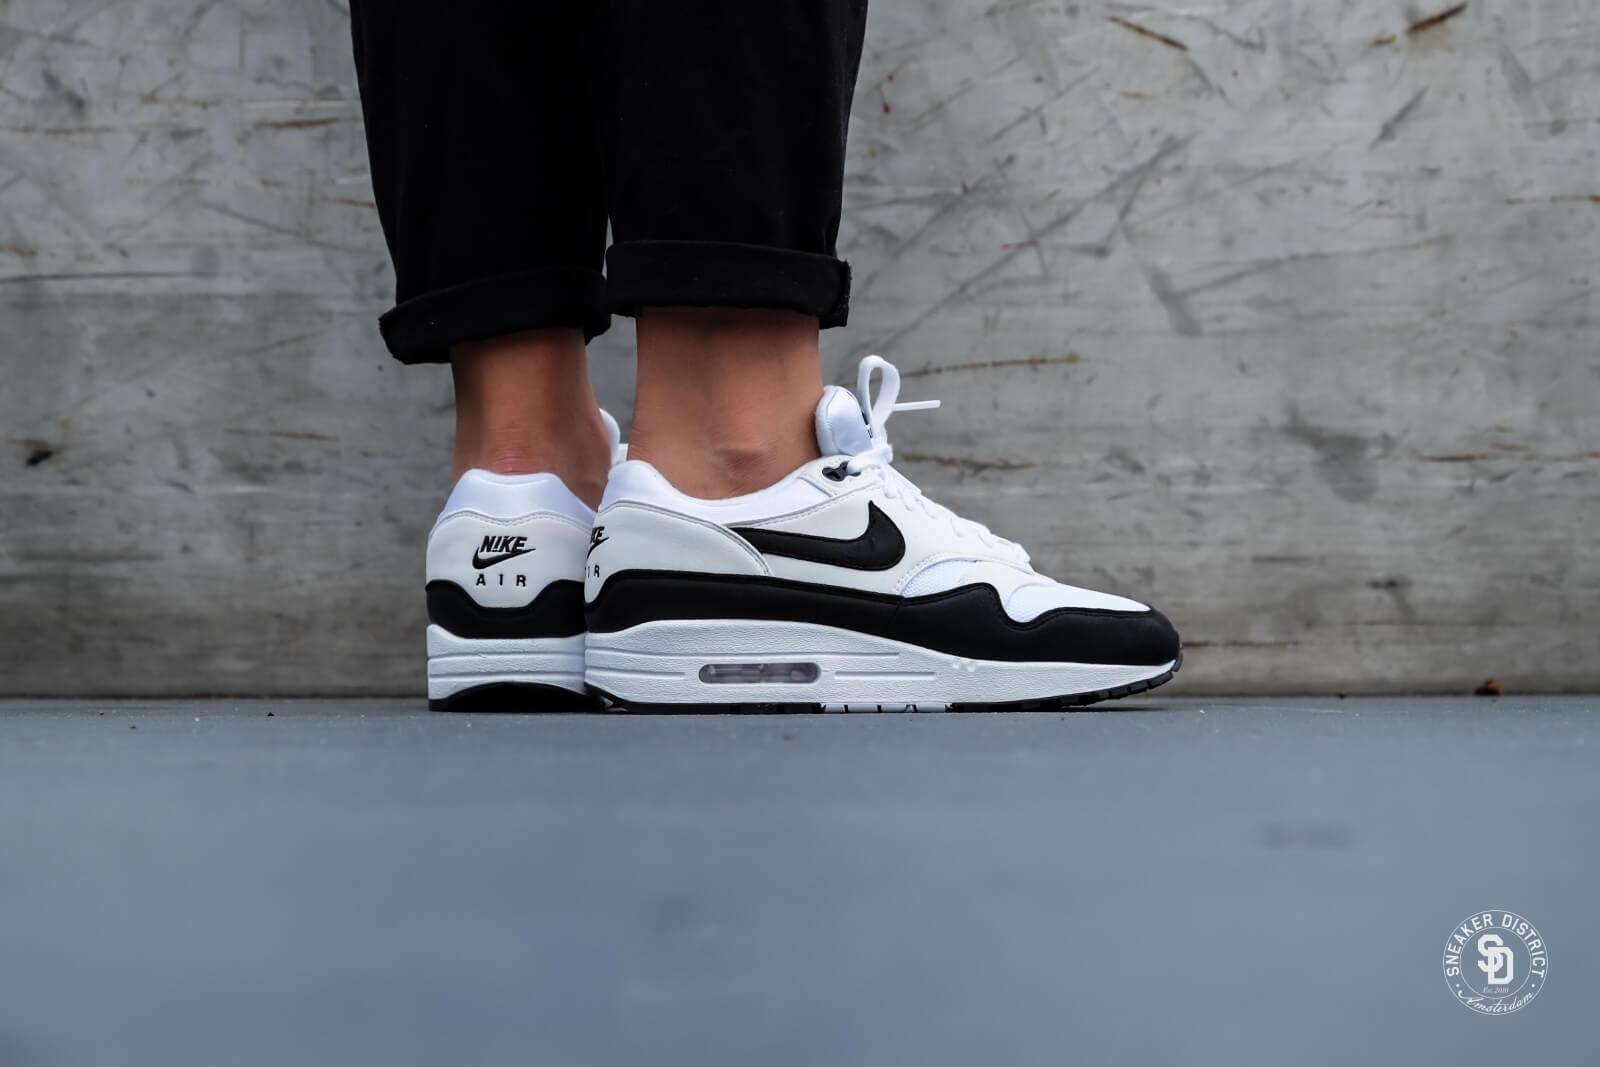 Nike Women's Air Max 1 White/Black